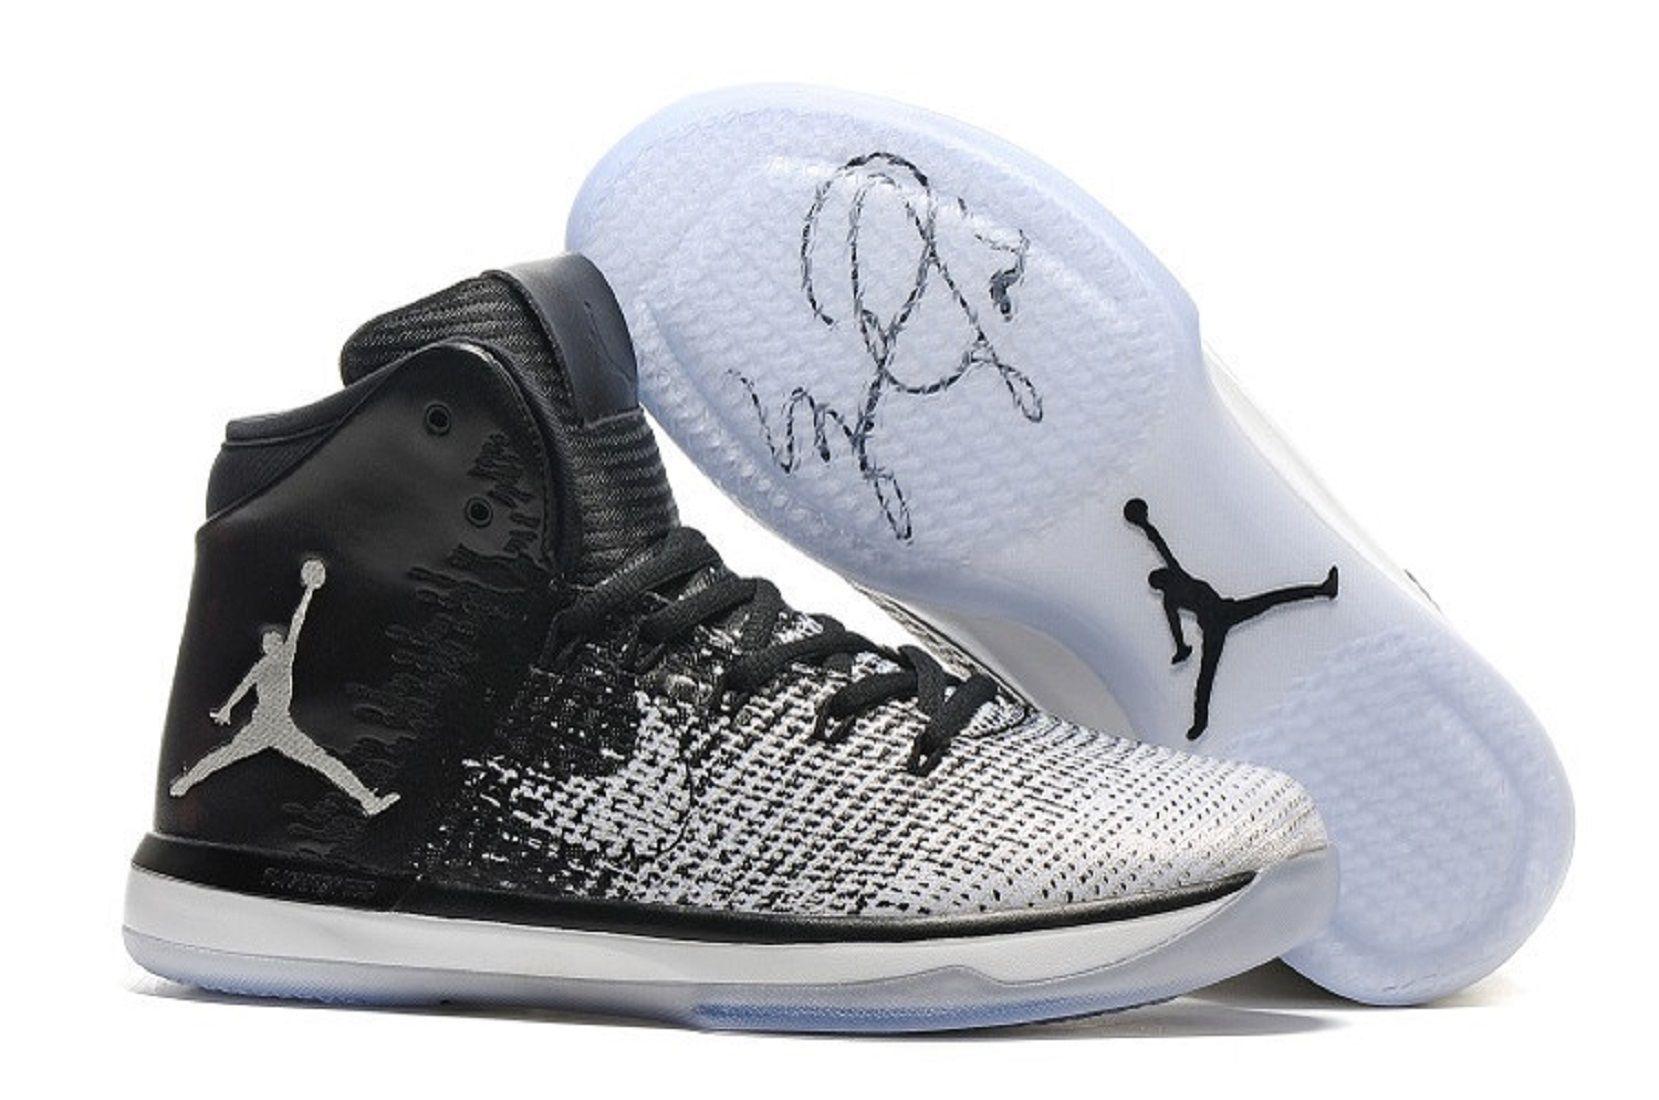 Nike 2018 Air Jordan 31 Fine Print White Basketball Shoes